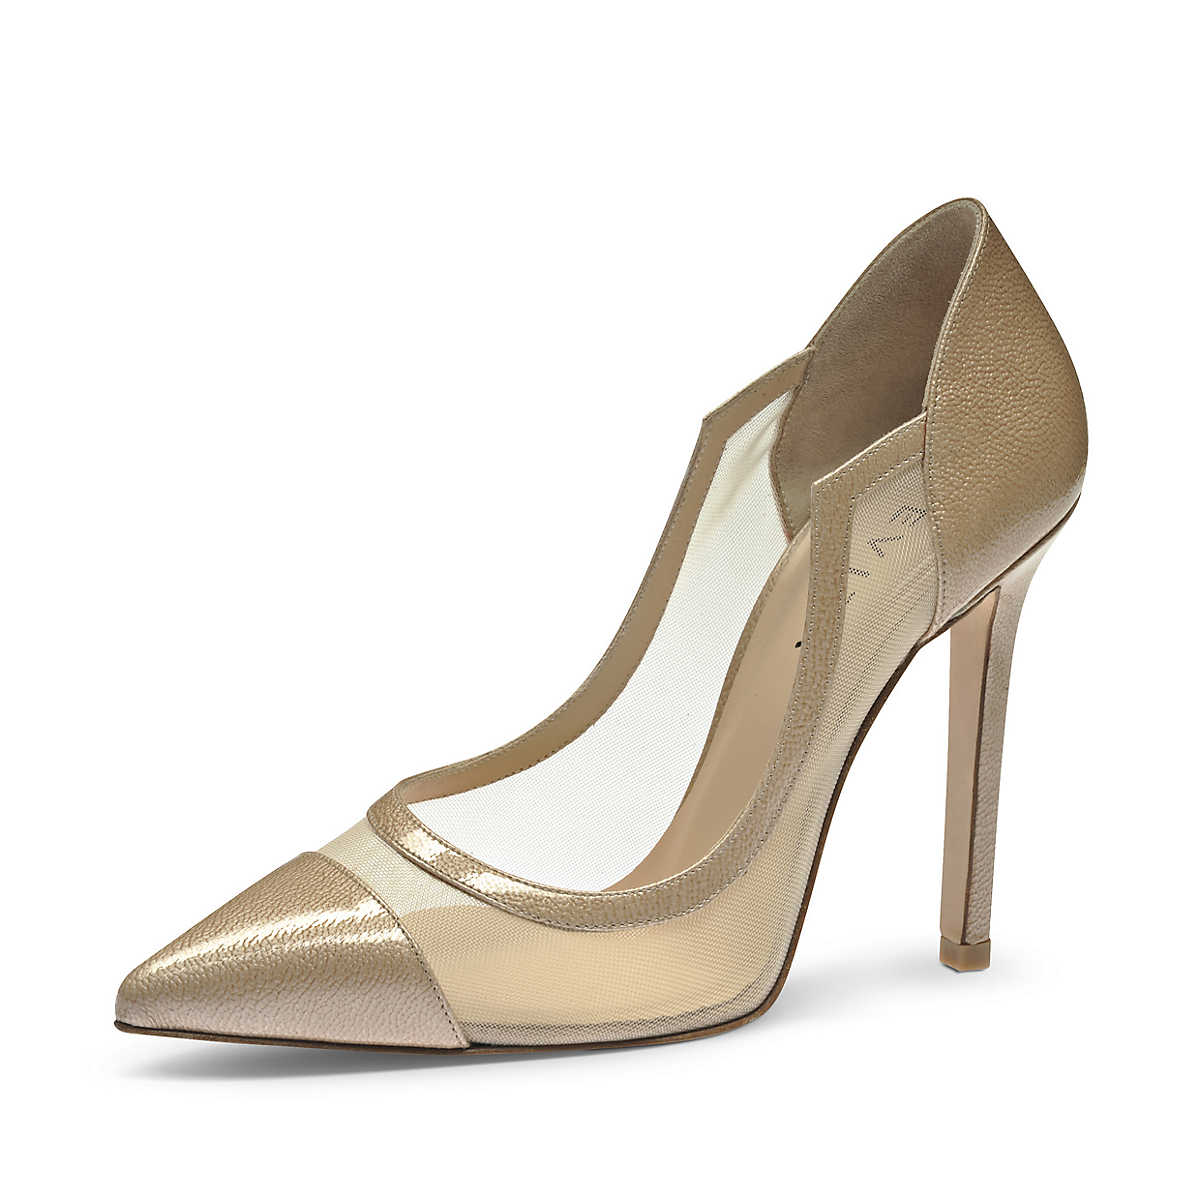 Evita Shoes Pumps beige - Evita Shoes - Pumps - Schuhe - mirapodo.de